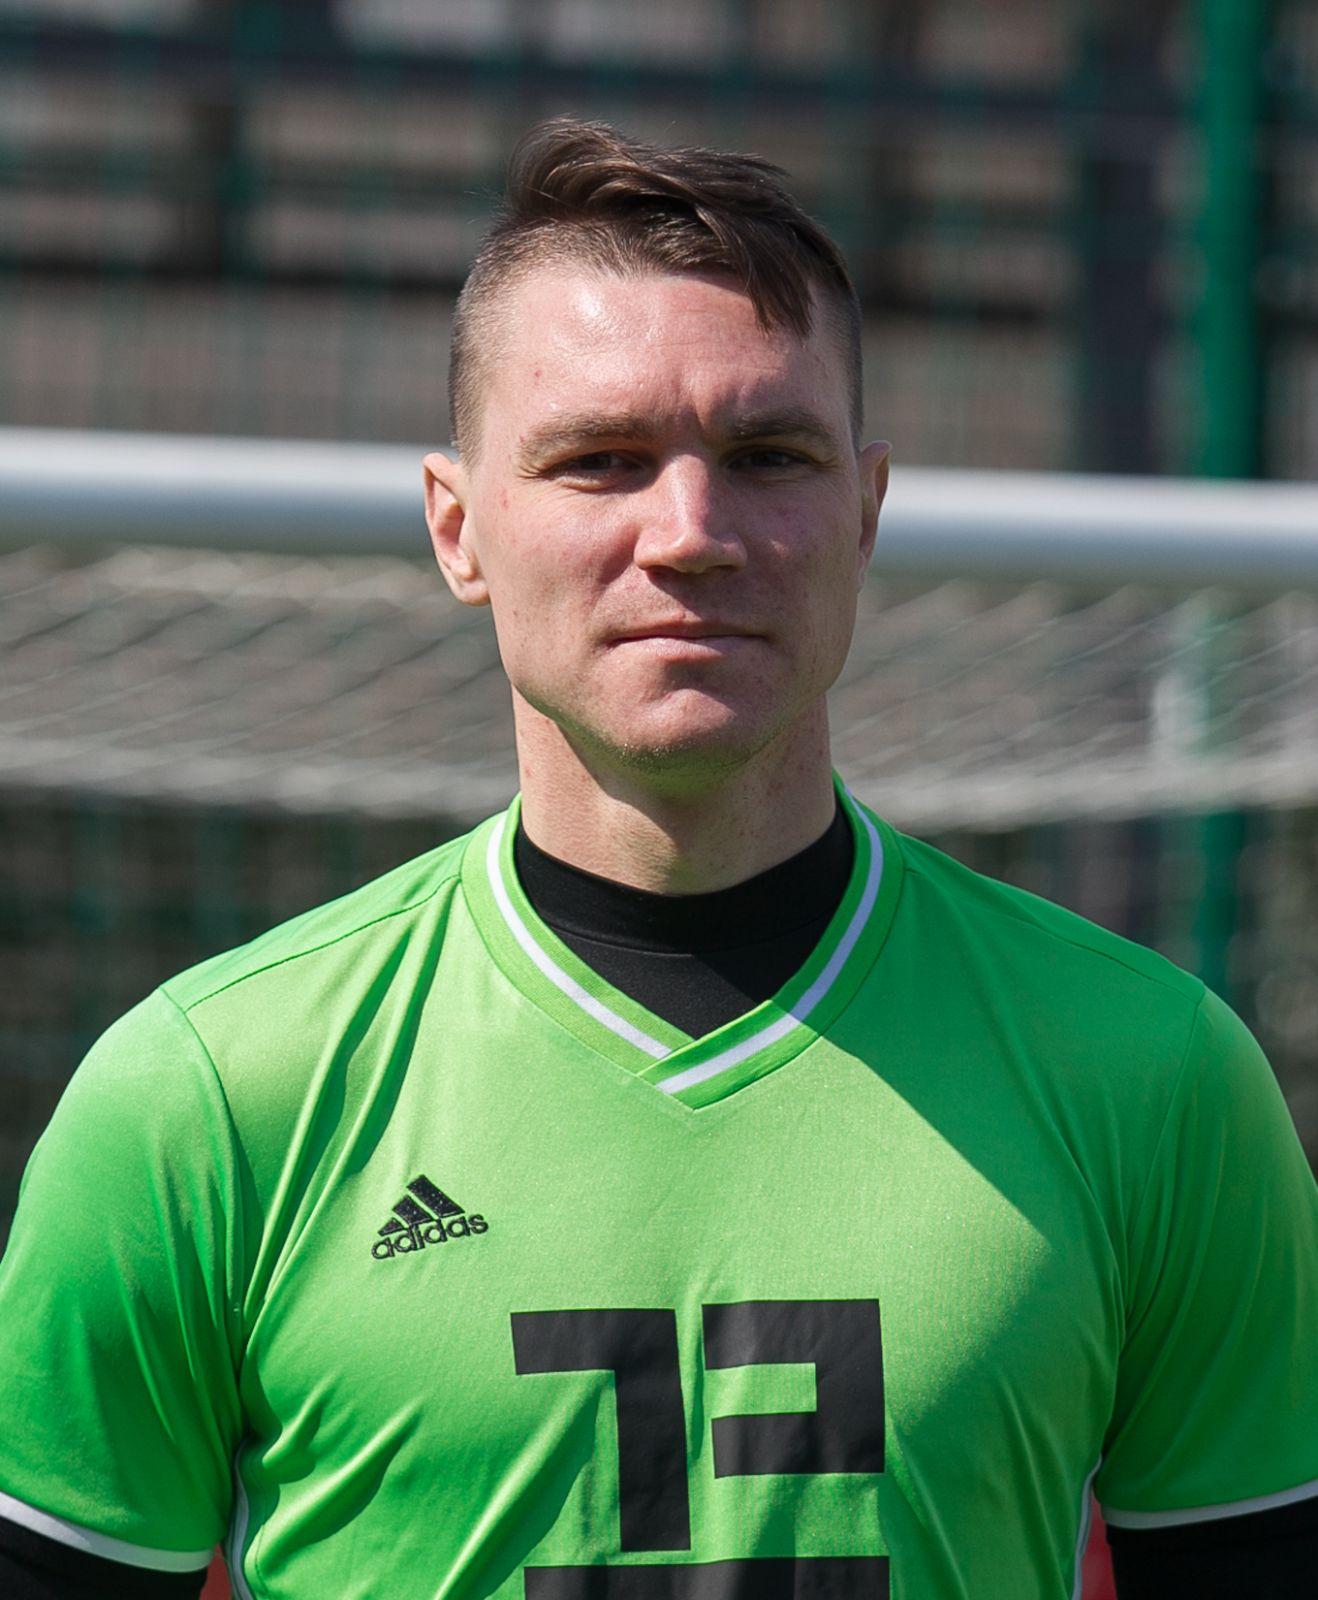 Боровский Евгений